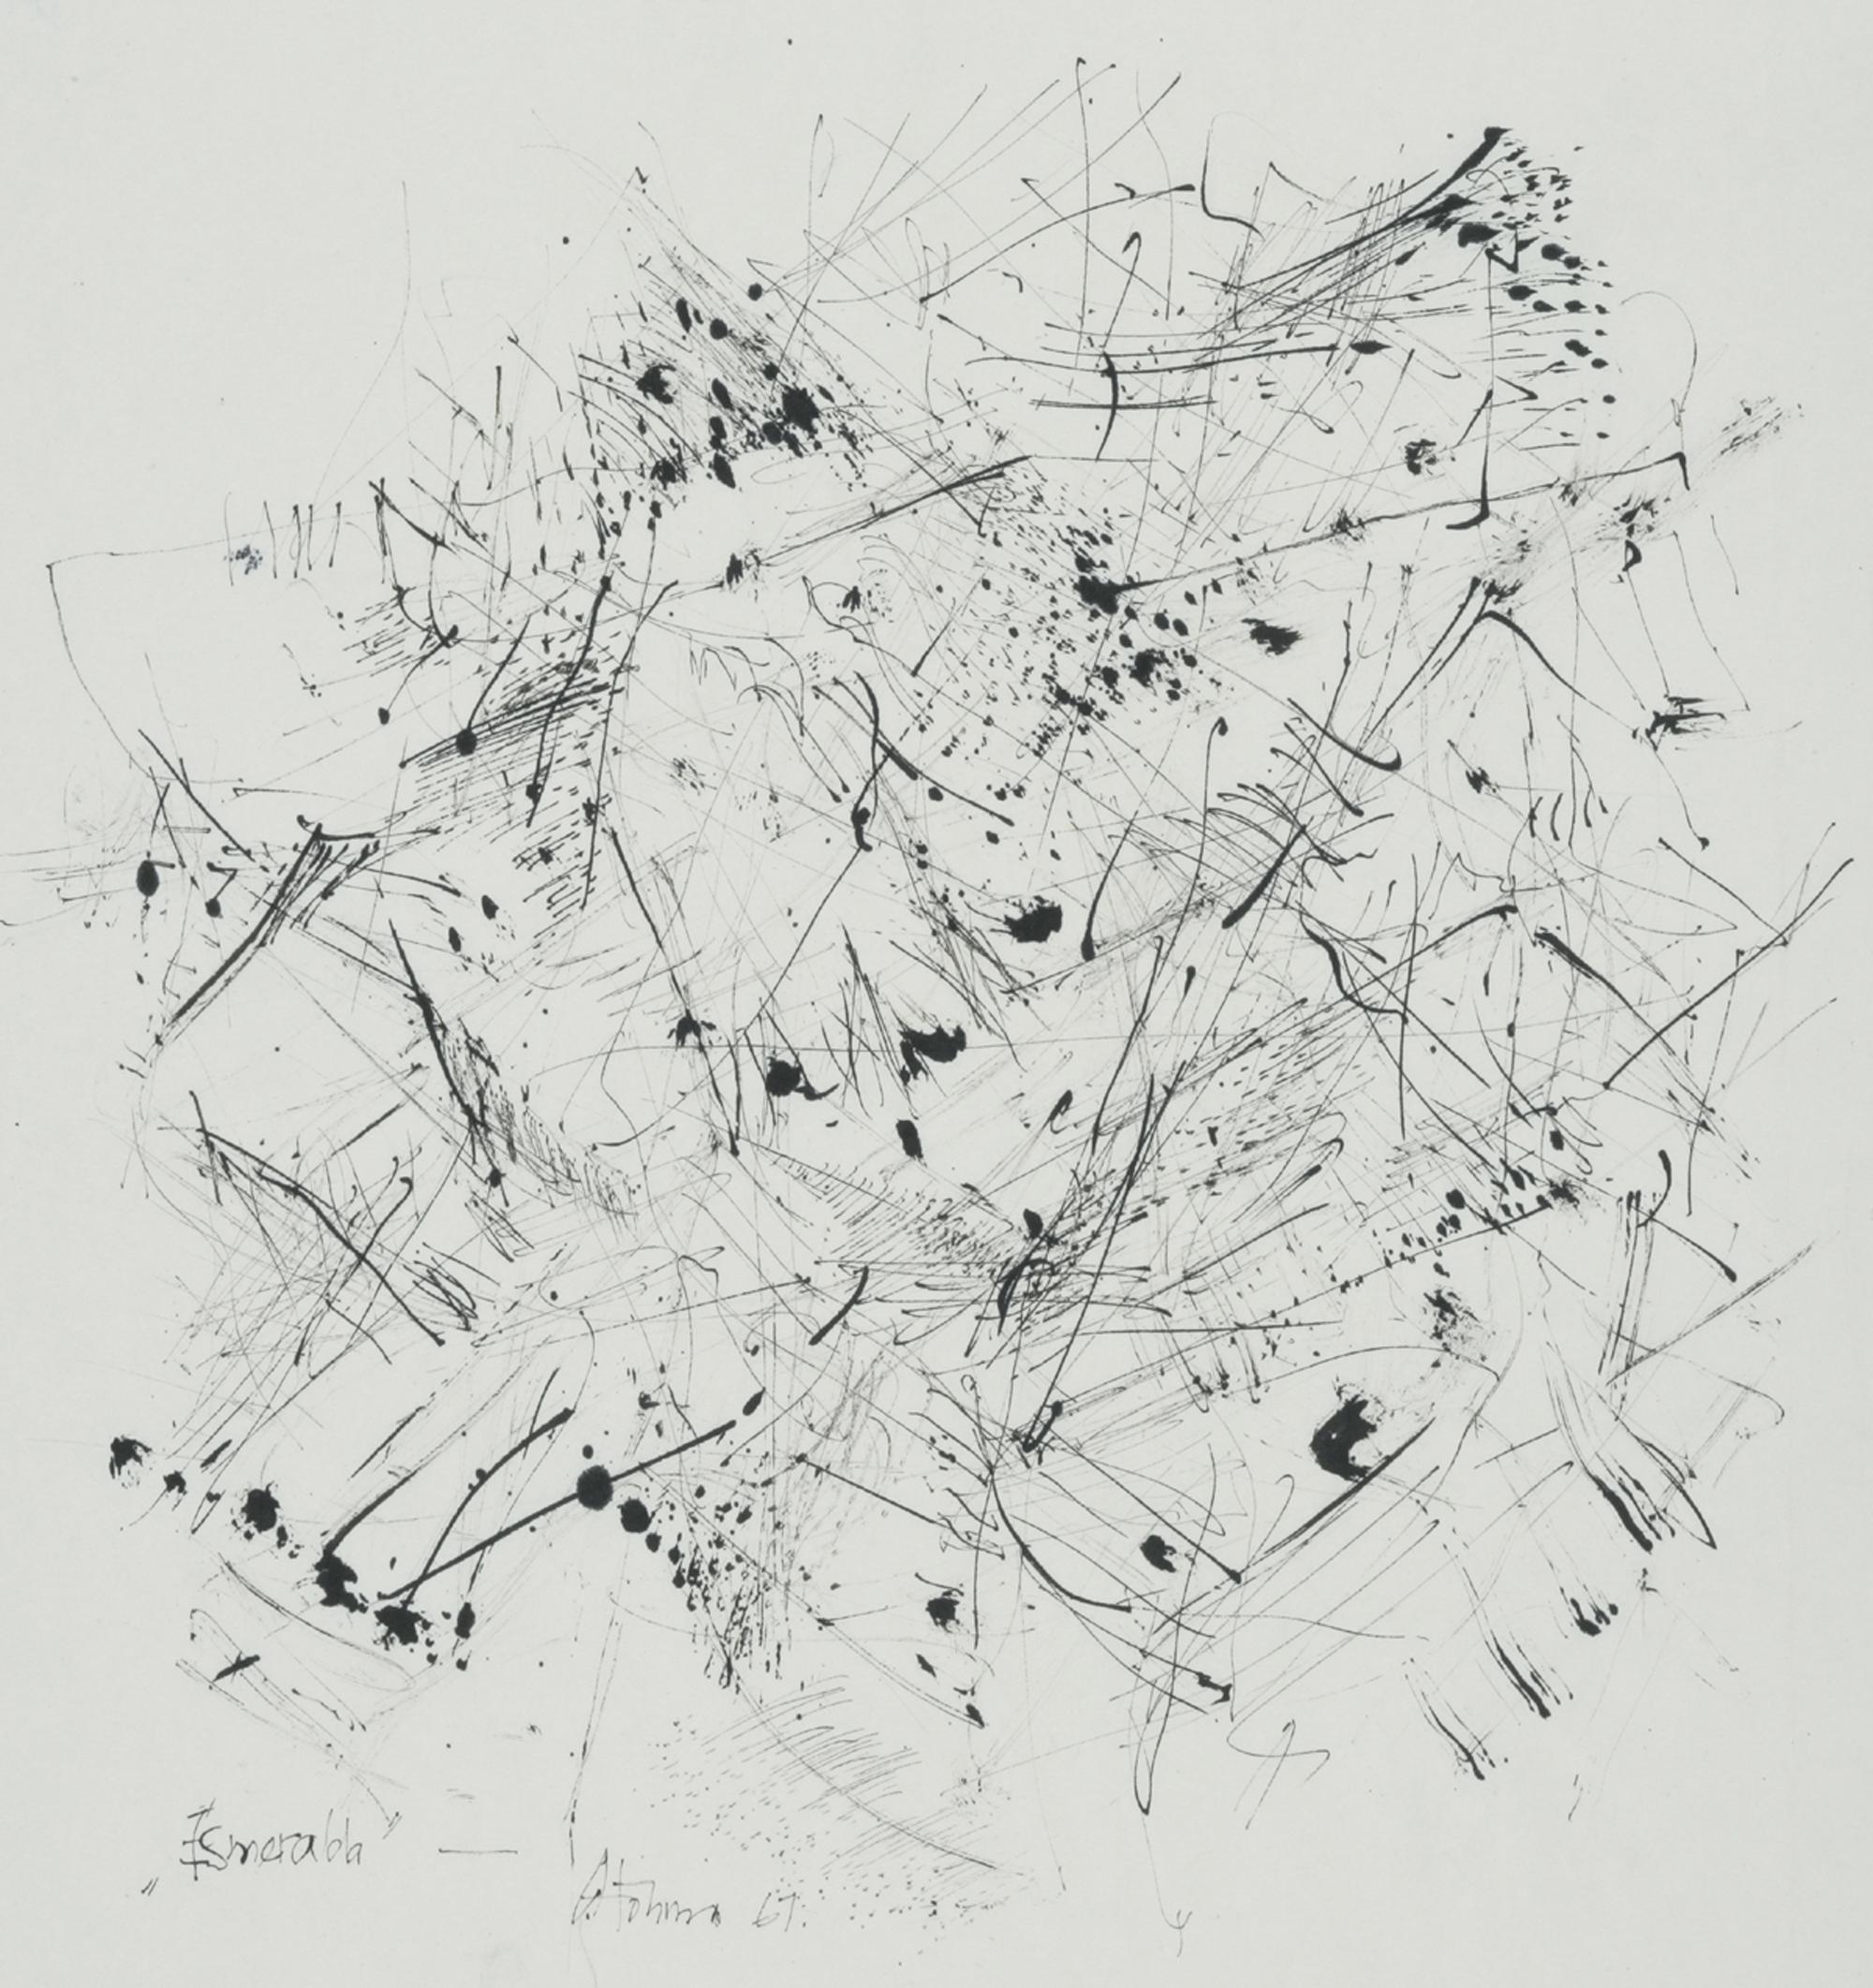 Gerhard Hoehme - Geordnetes Chaos